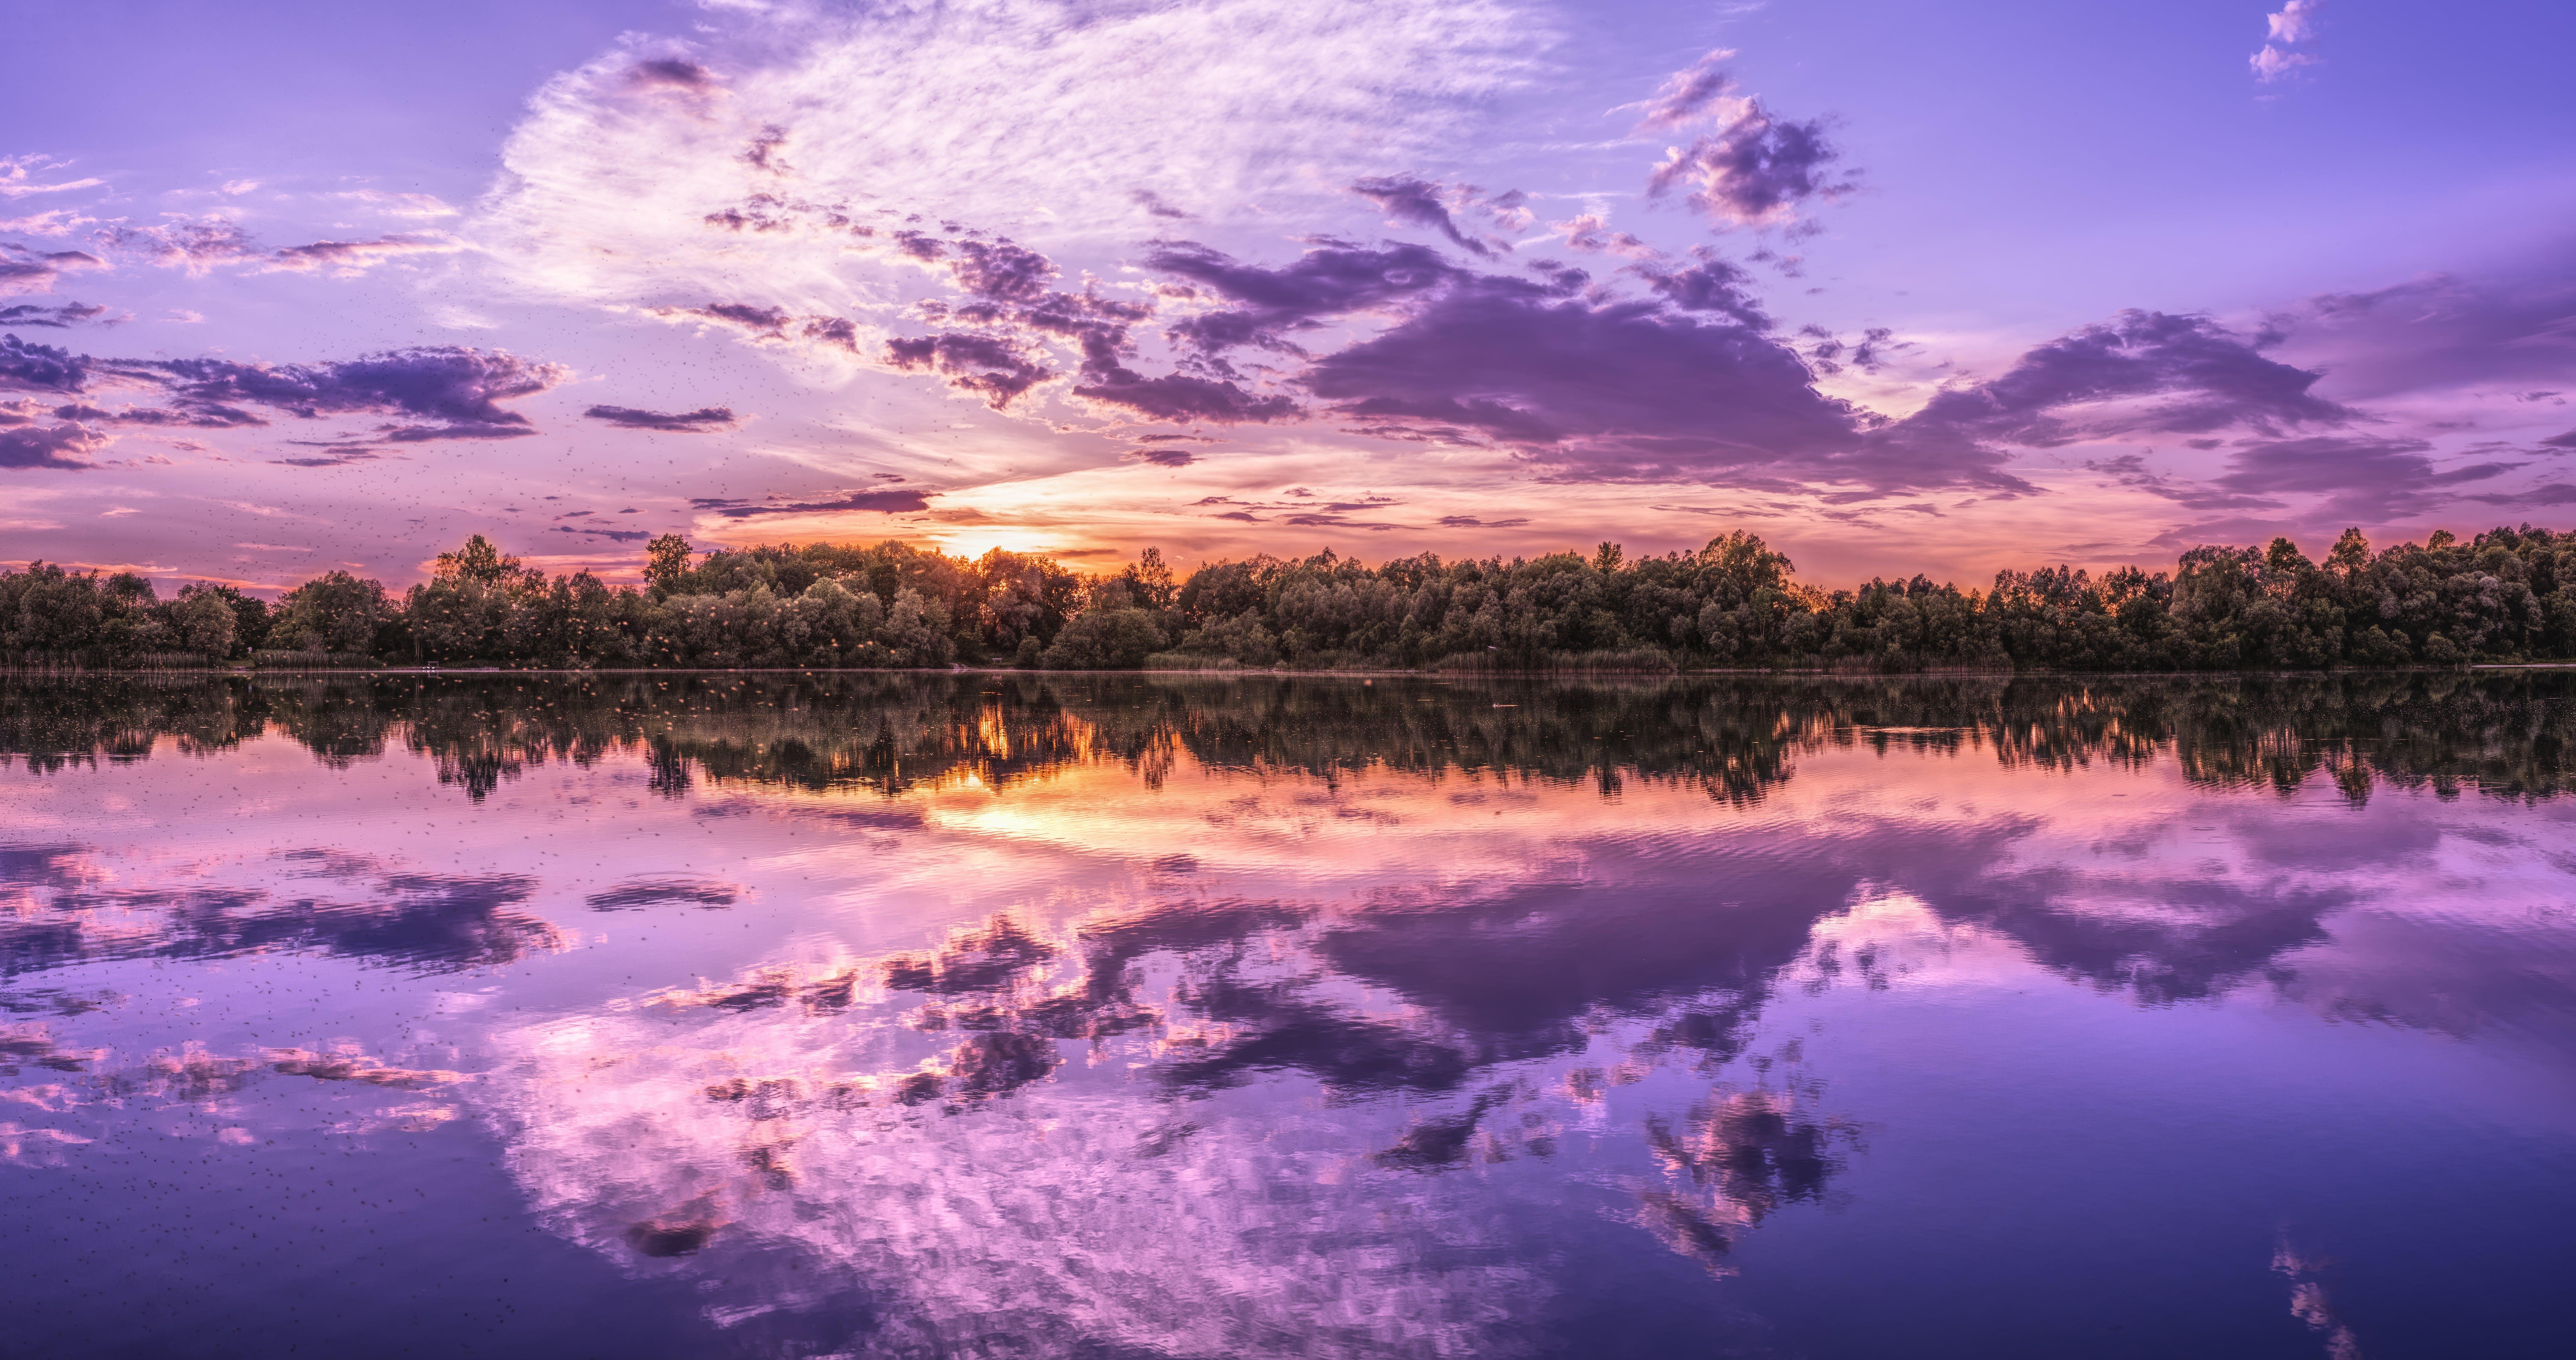 Kostenloses Stock Foto zu natur, himmel, sonnenuntergang, wolken